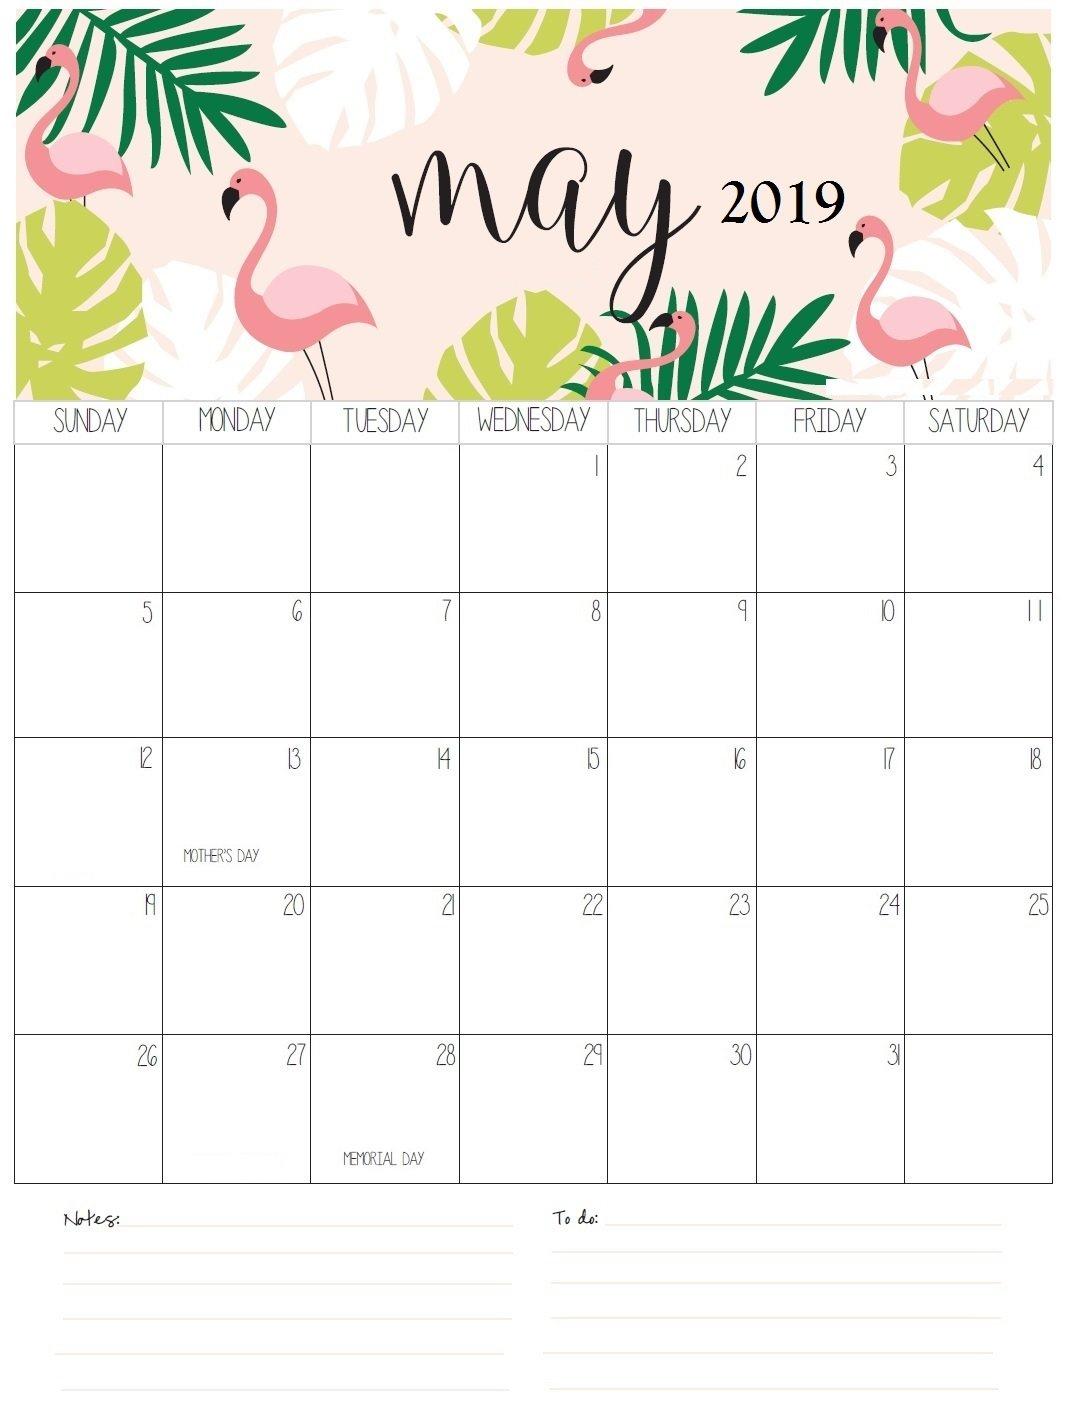 May 2019 South Africa Calendar – 2019 Calendar Templates Printable Calendar 2019 Create